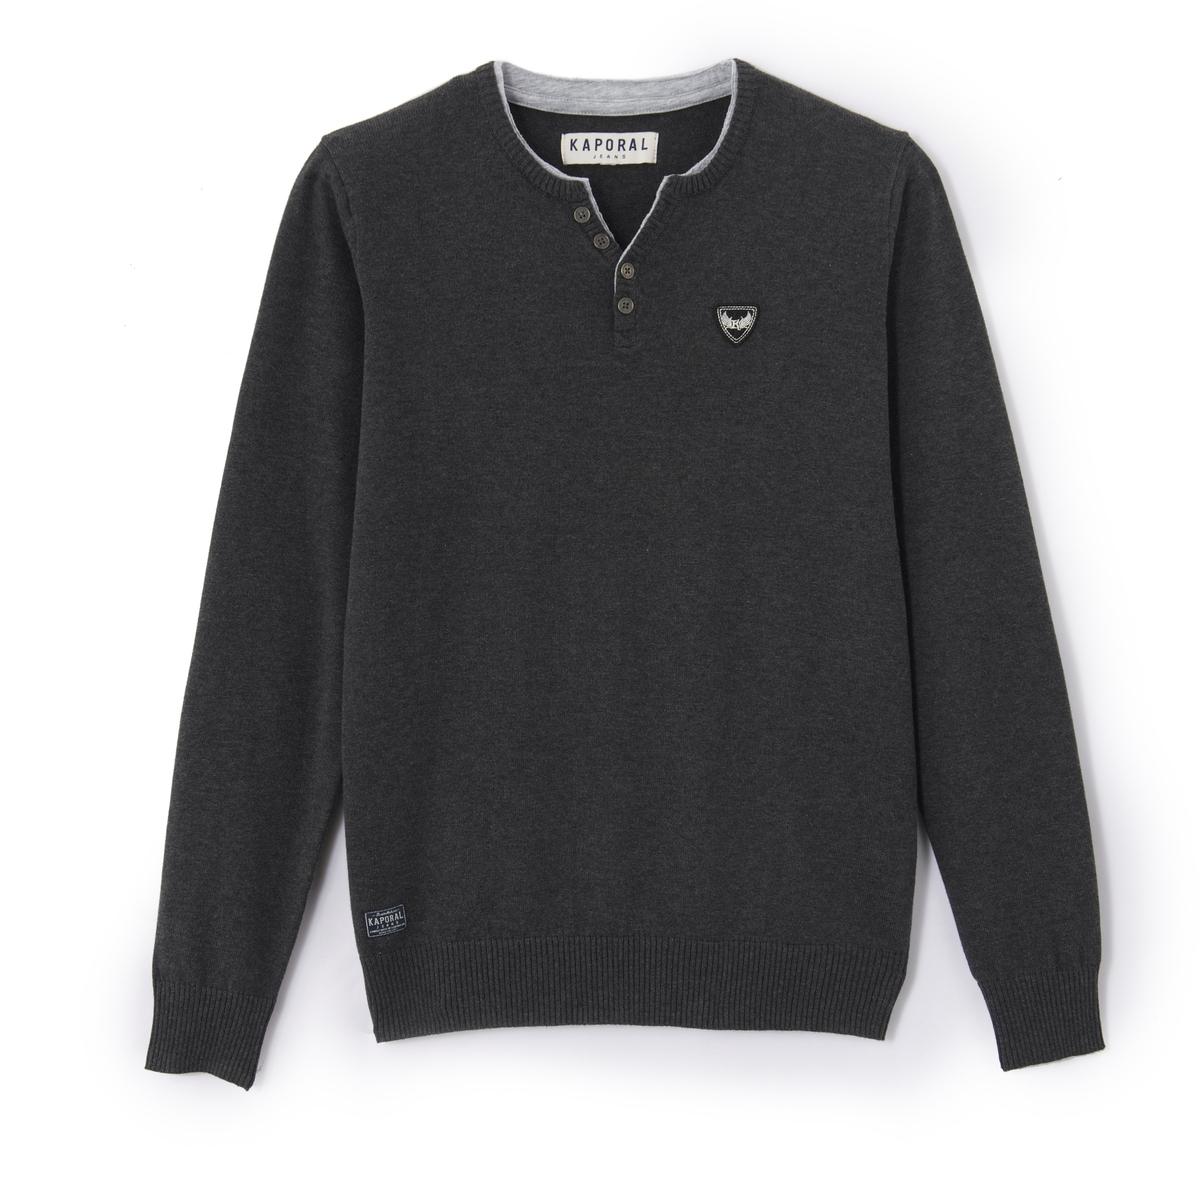 Пуловер с разрезом на круглом вырезе из тонкого трикотажа